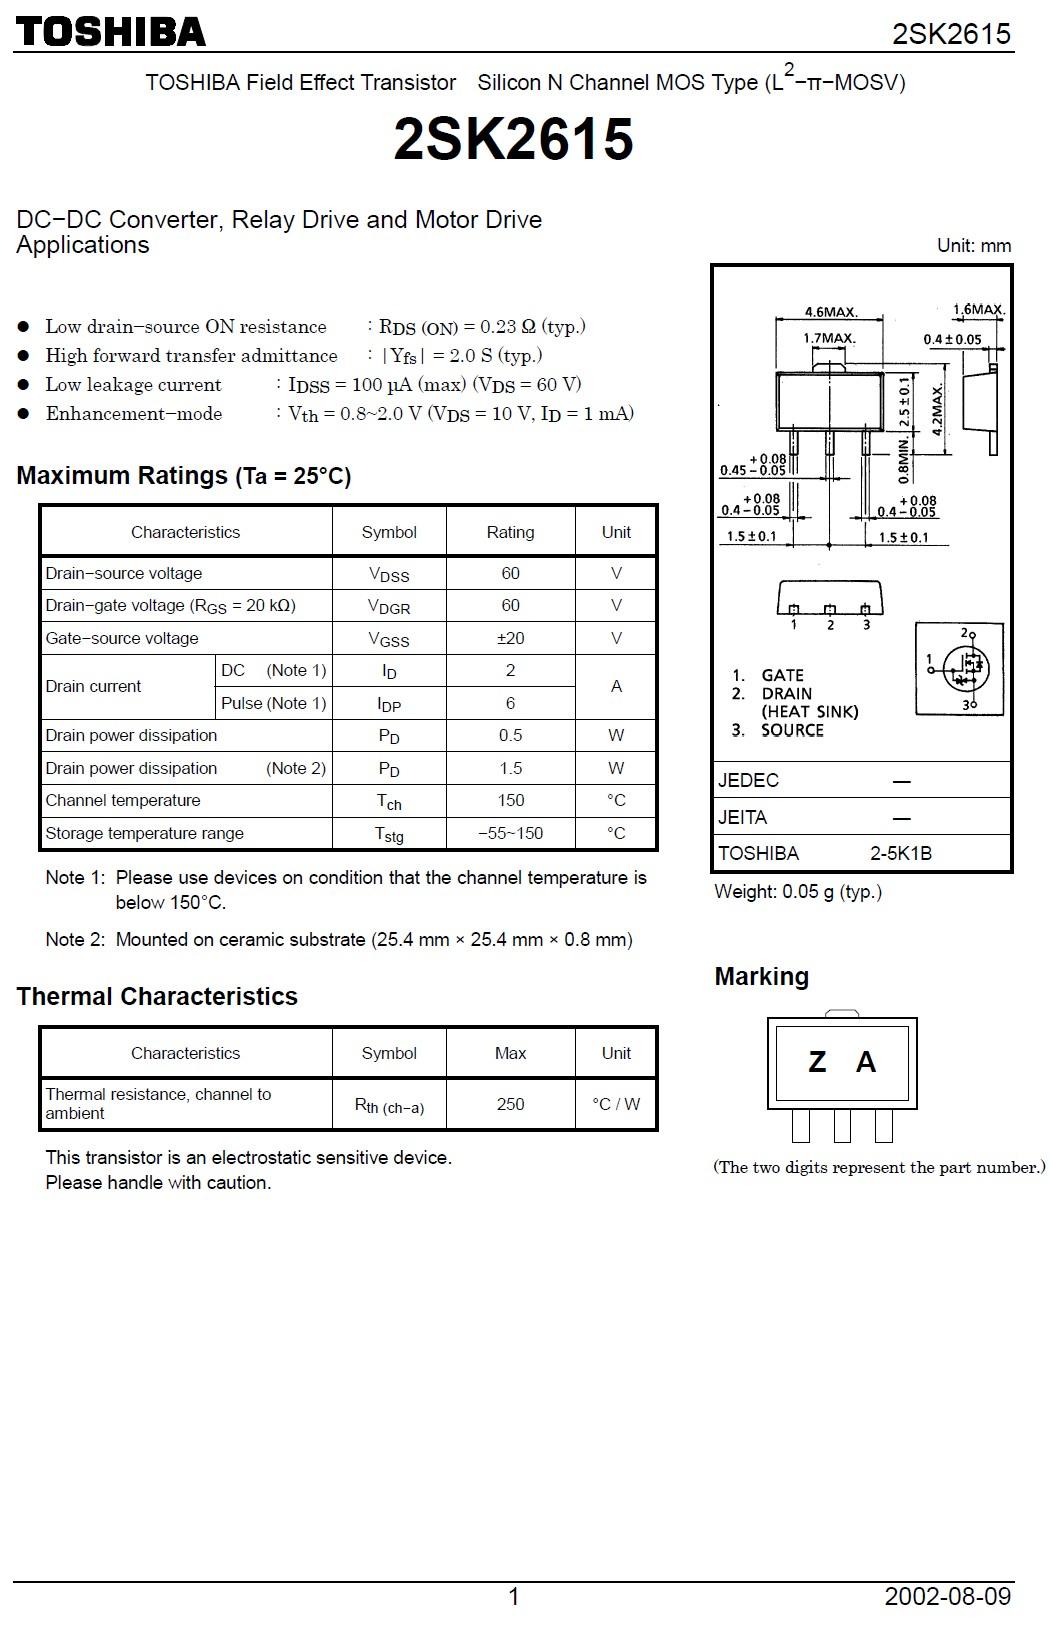 Tranzisztor N-MOSFET 60V 2A/6A 1.5W 0.33R (1.5A) 2SK2615 2SK2615 -